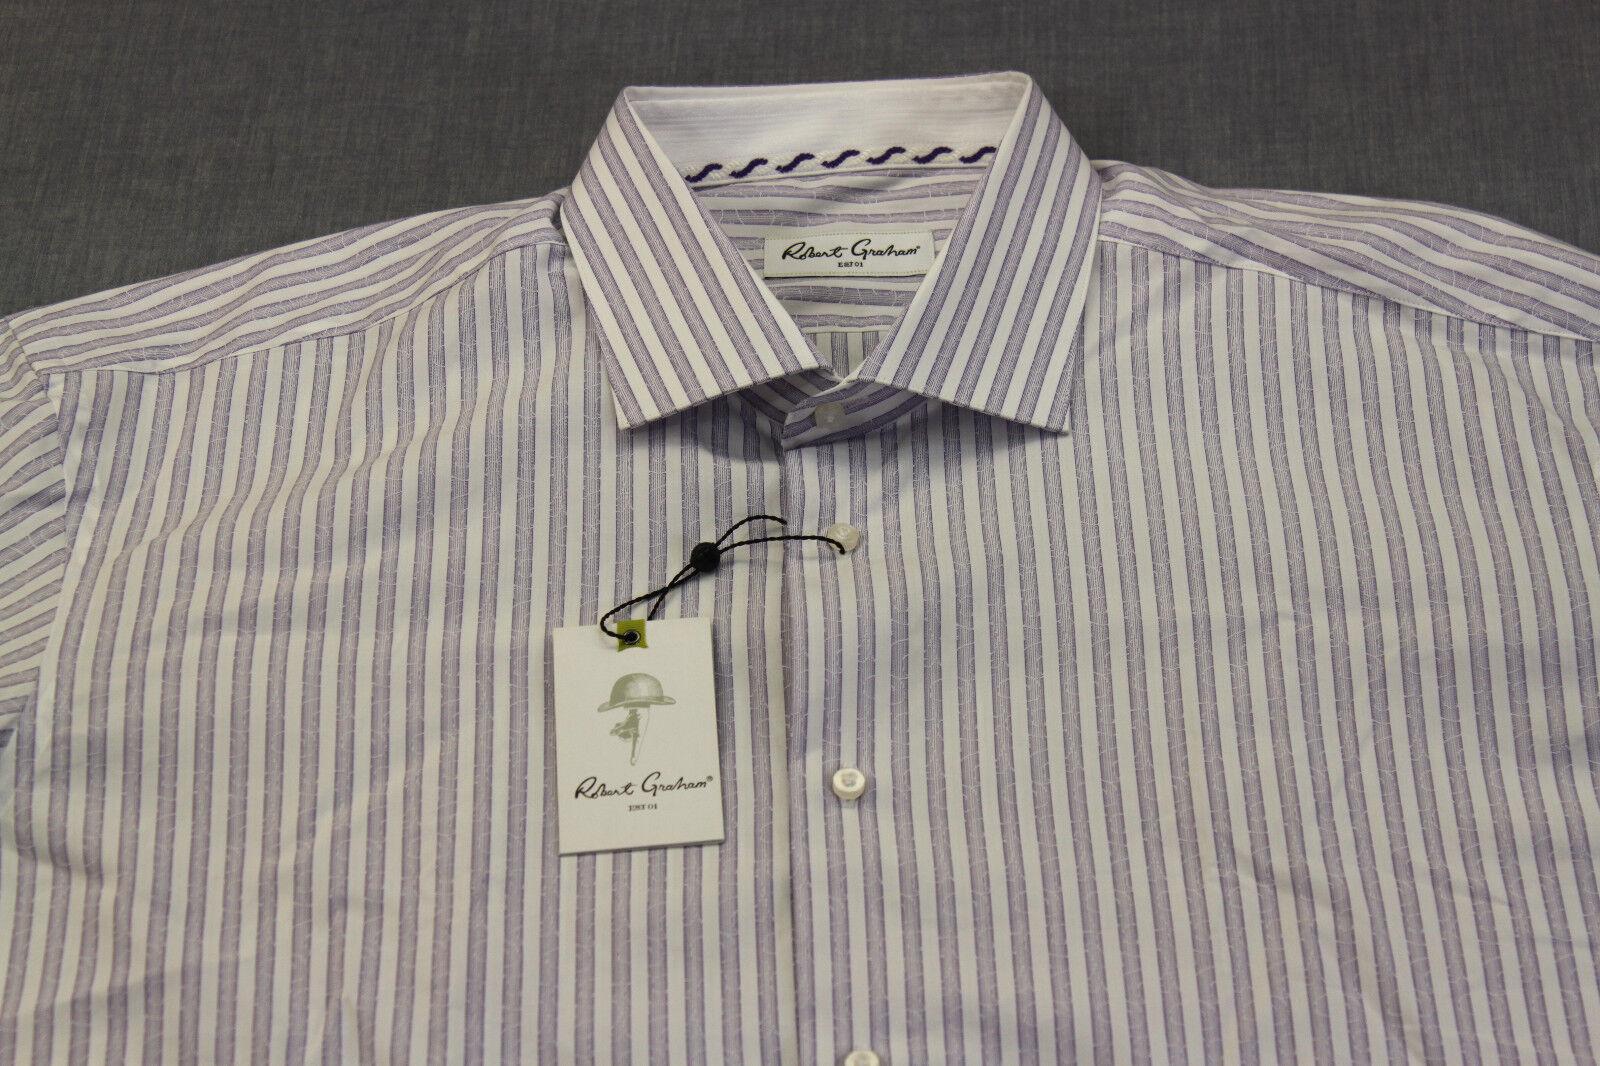 ROBERT GRAHAM HALE RC herren lila & Weiß STRIPE WOVEN hemd NWT 18  EUR 46  2XL